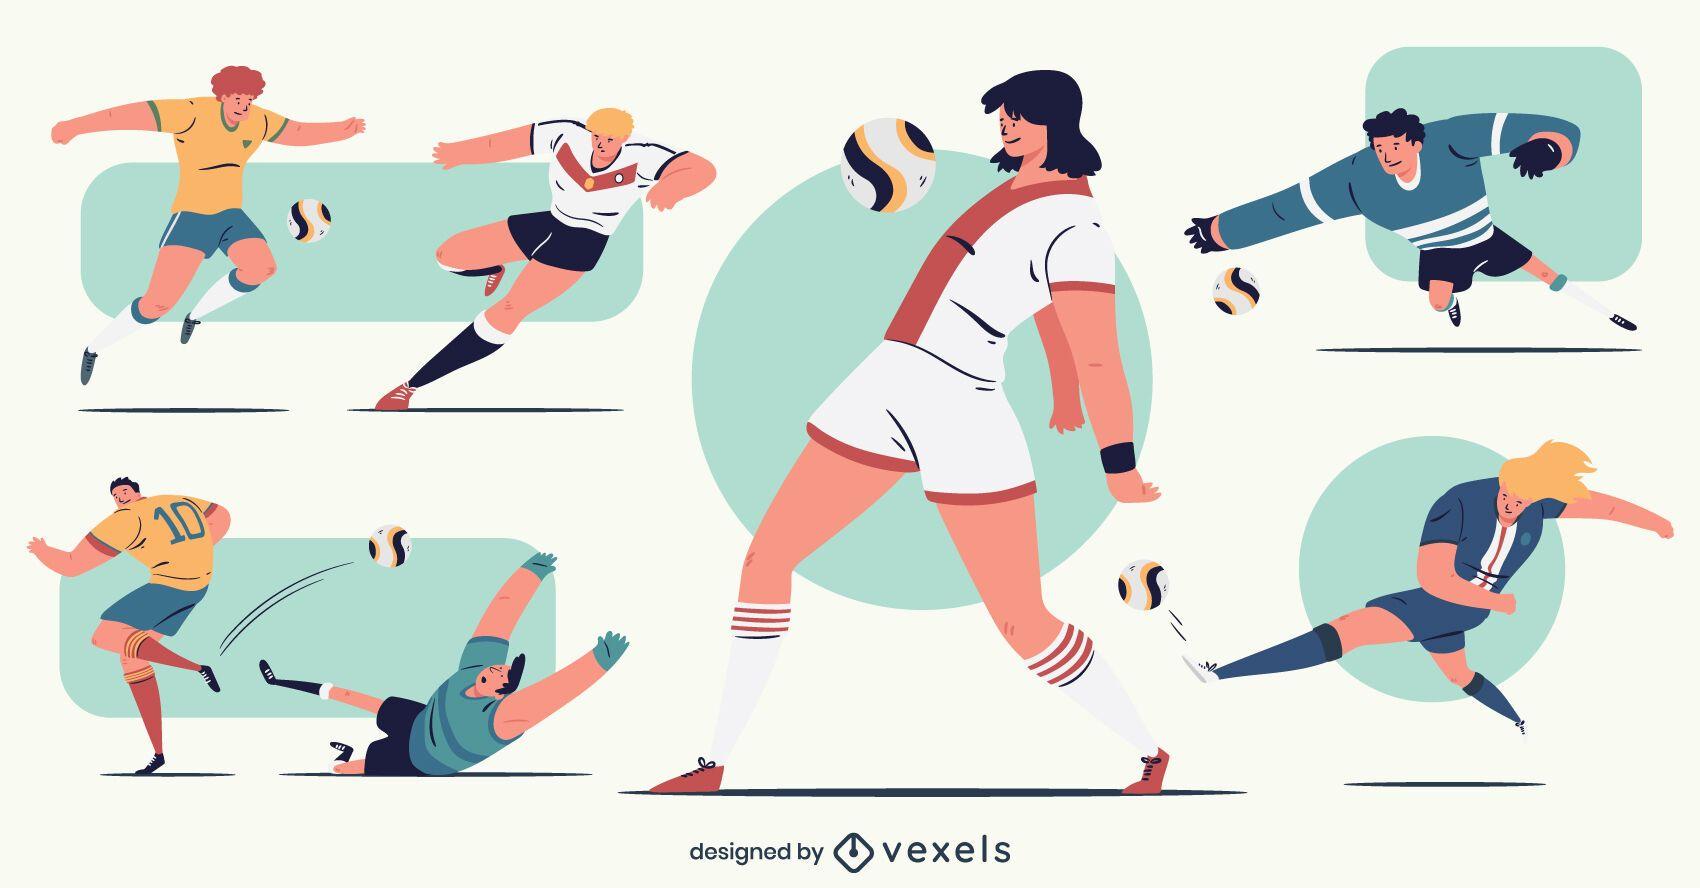 Pack de personajes de jugadores de fútbol masculino